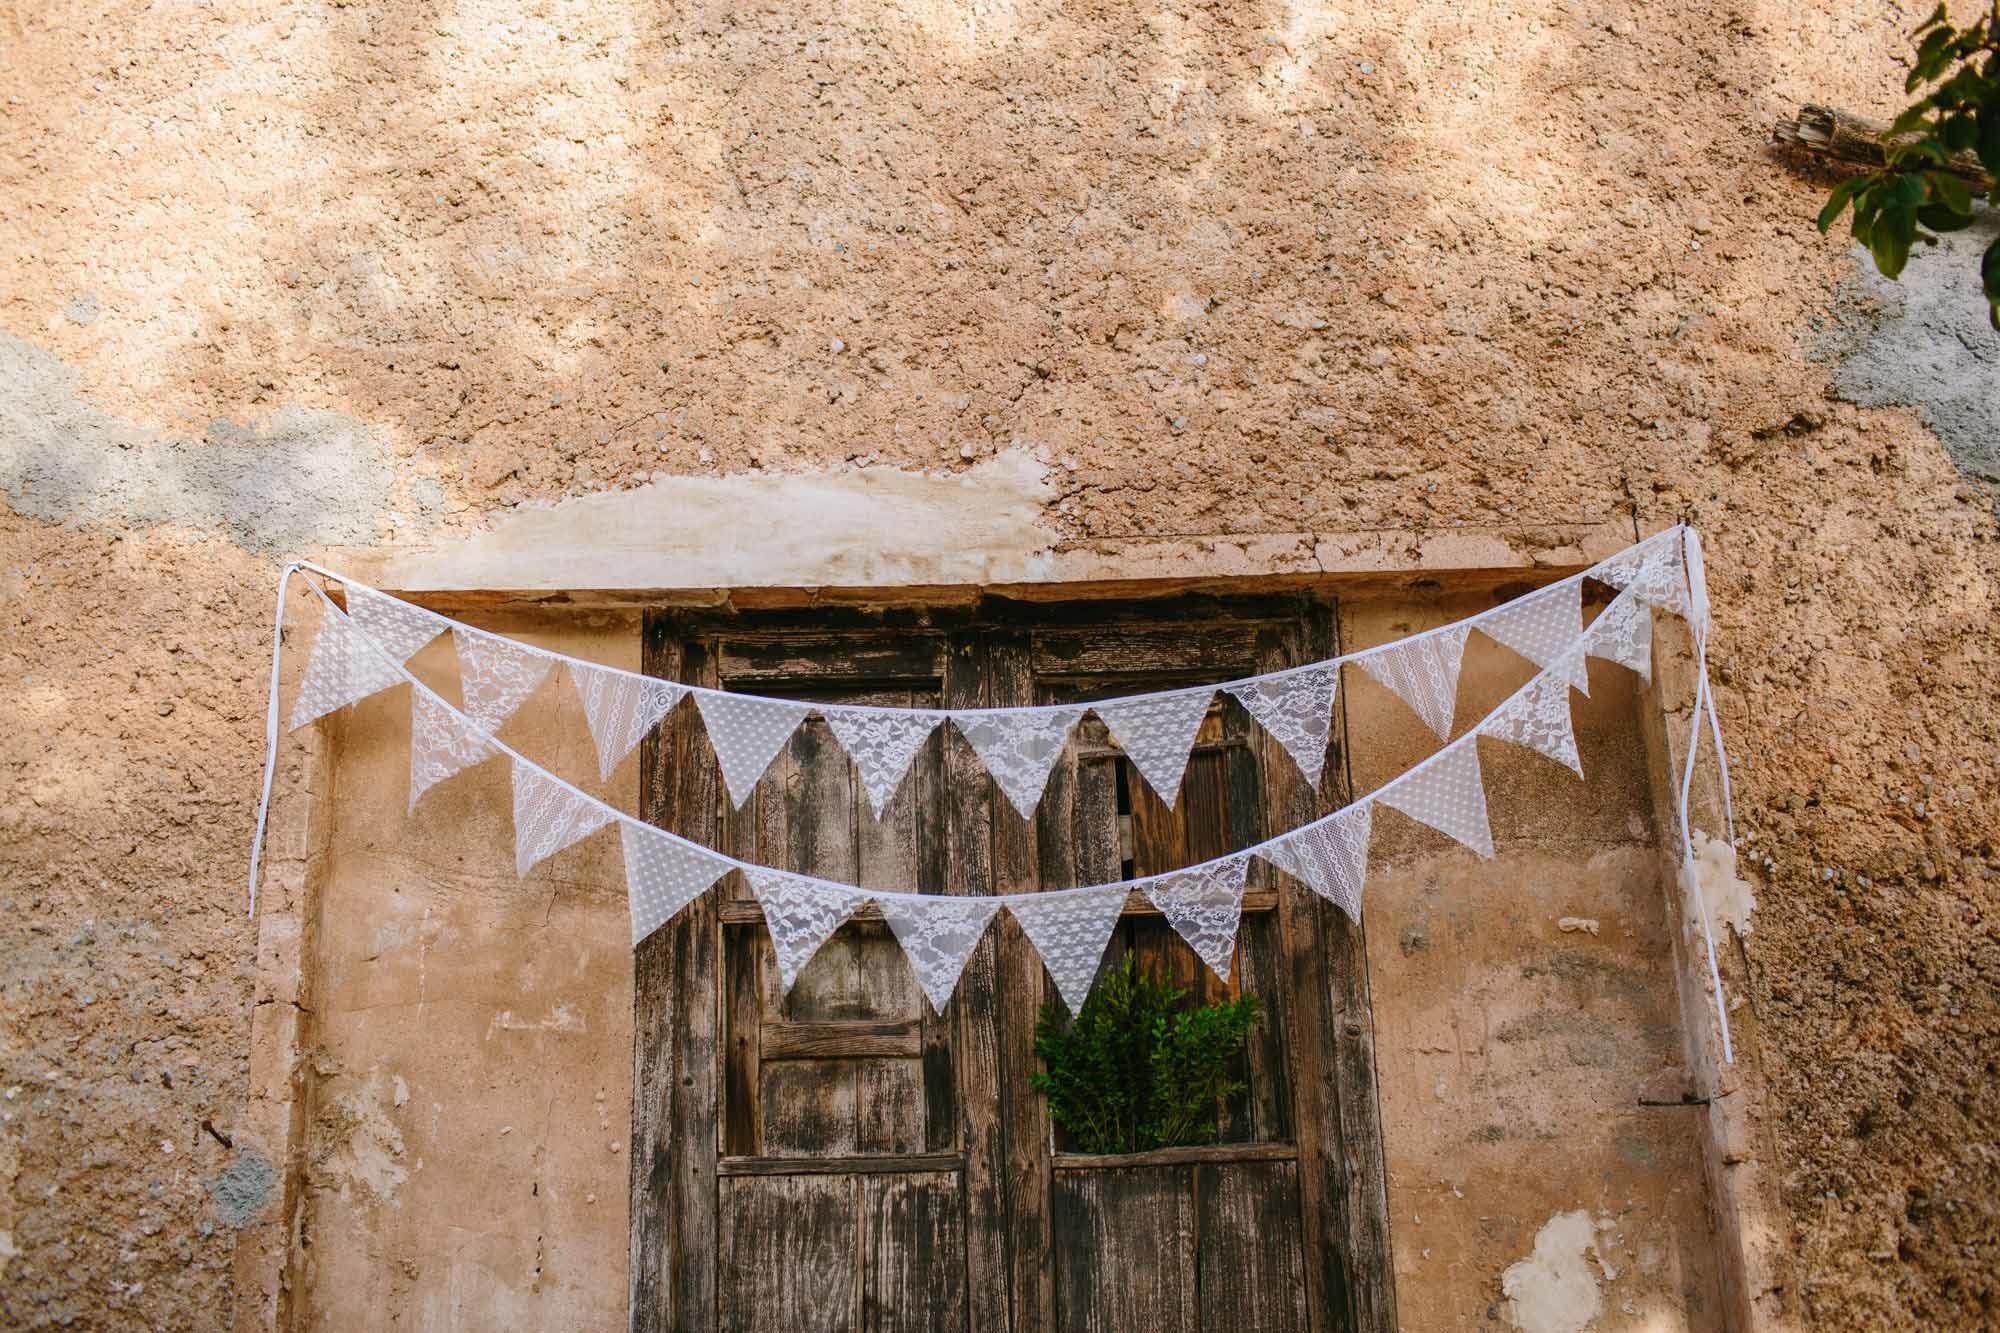 fotografos-de-boda-marie-mari-en-almeria-001